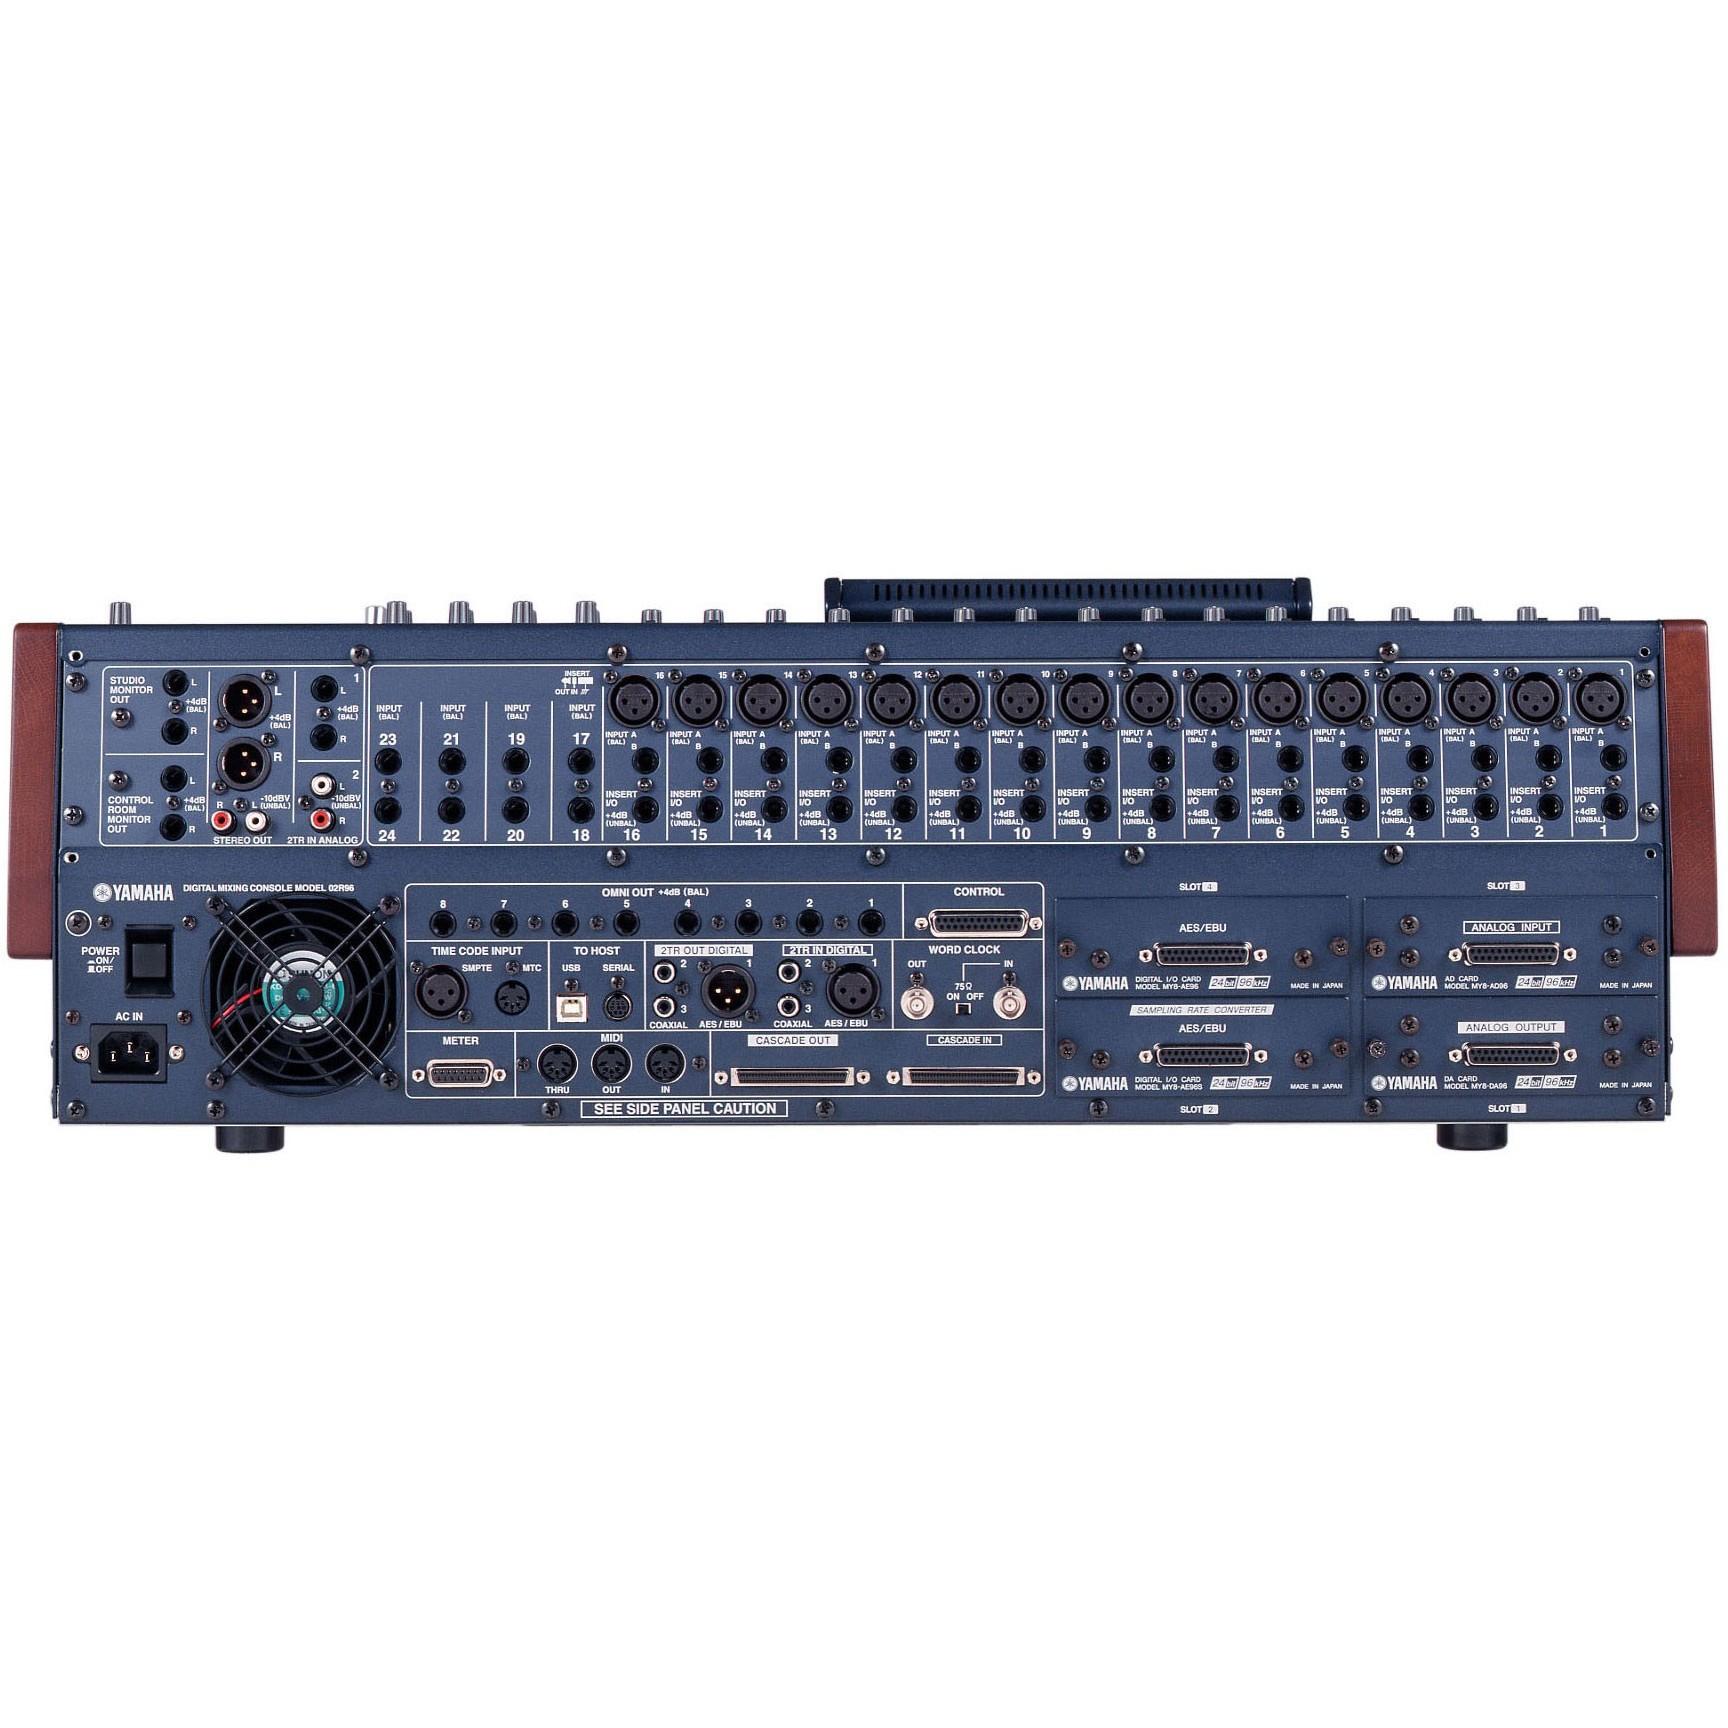 Yamaha 02r96vcm digital mixing console for Yamaha digital console